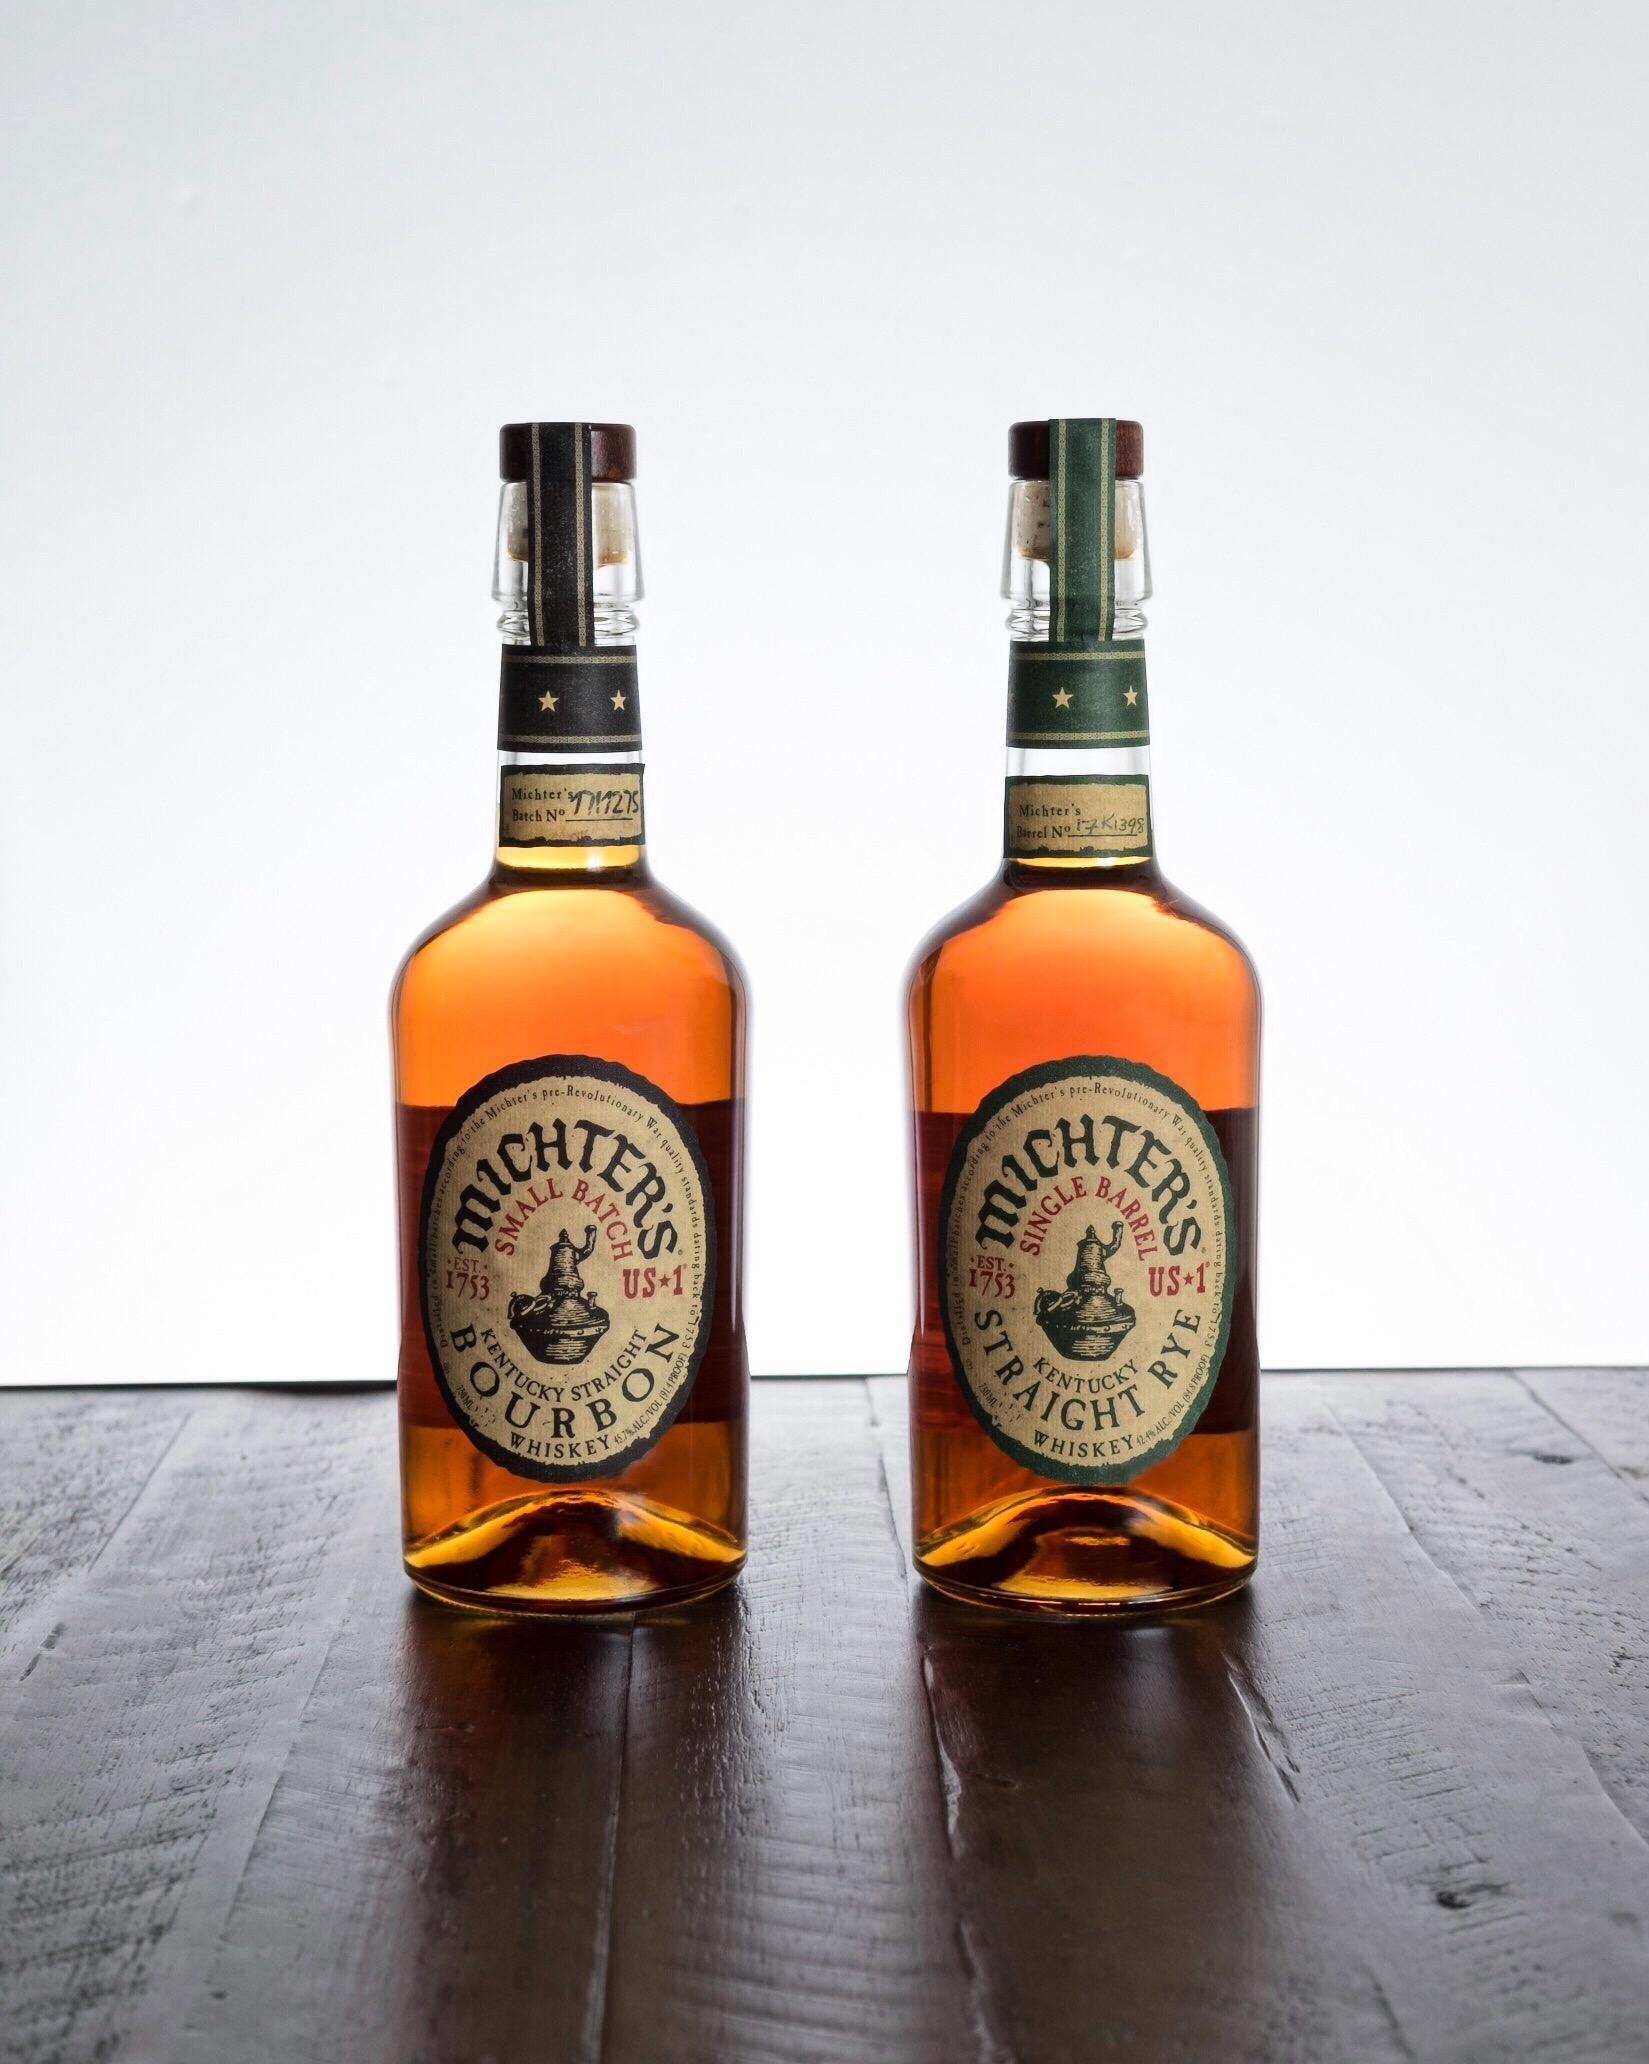 Michter's Whiskey - AGE: no age statementCOST: $40-$45ABV:Bourbon: 45.7%Rye: 42.4%DEFINING FLAVORS:Bourbon: Sweet & SpicyRye: Spicy & Rich